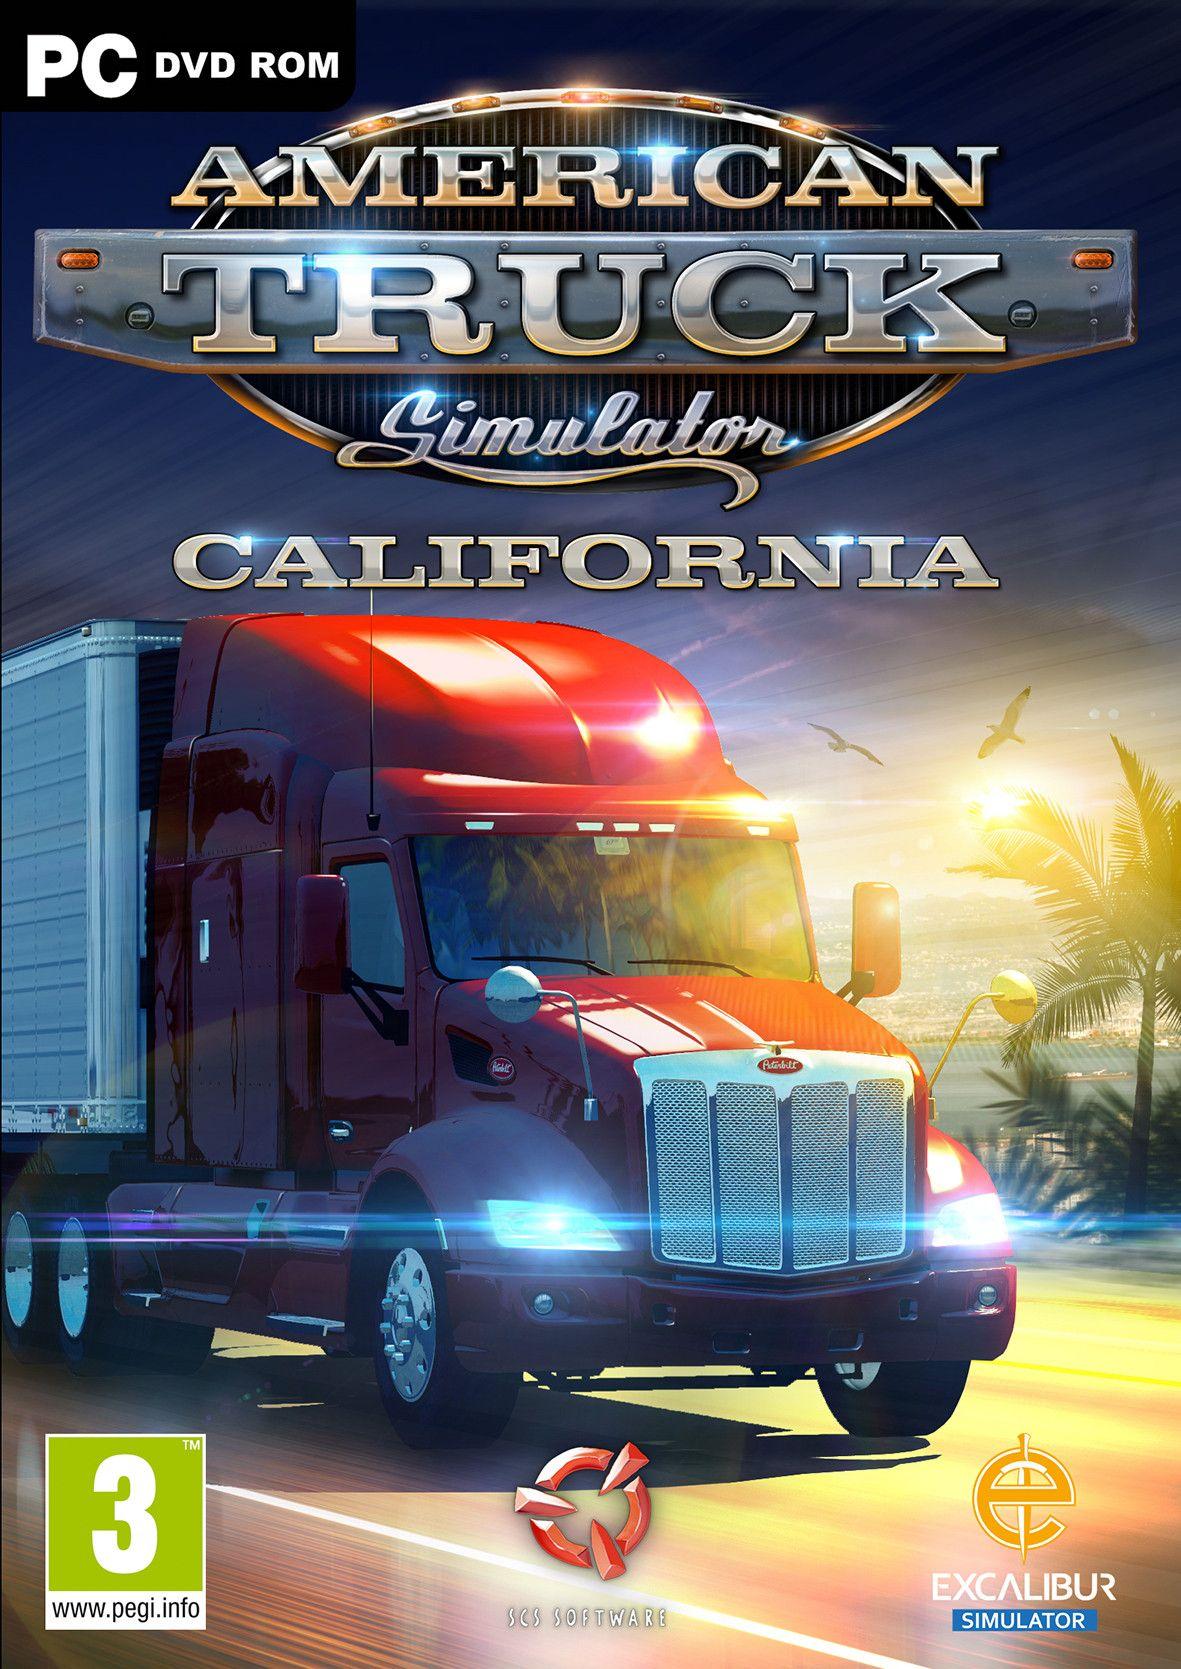 American Truck Simulator PC + Tüm DLC Türkçe 21 DLC